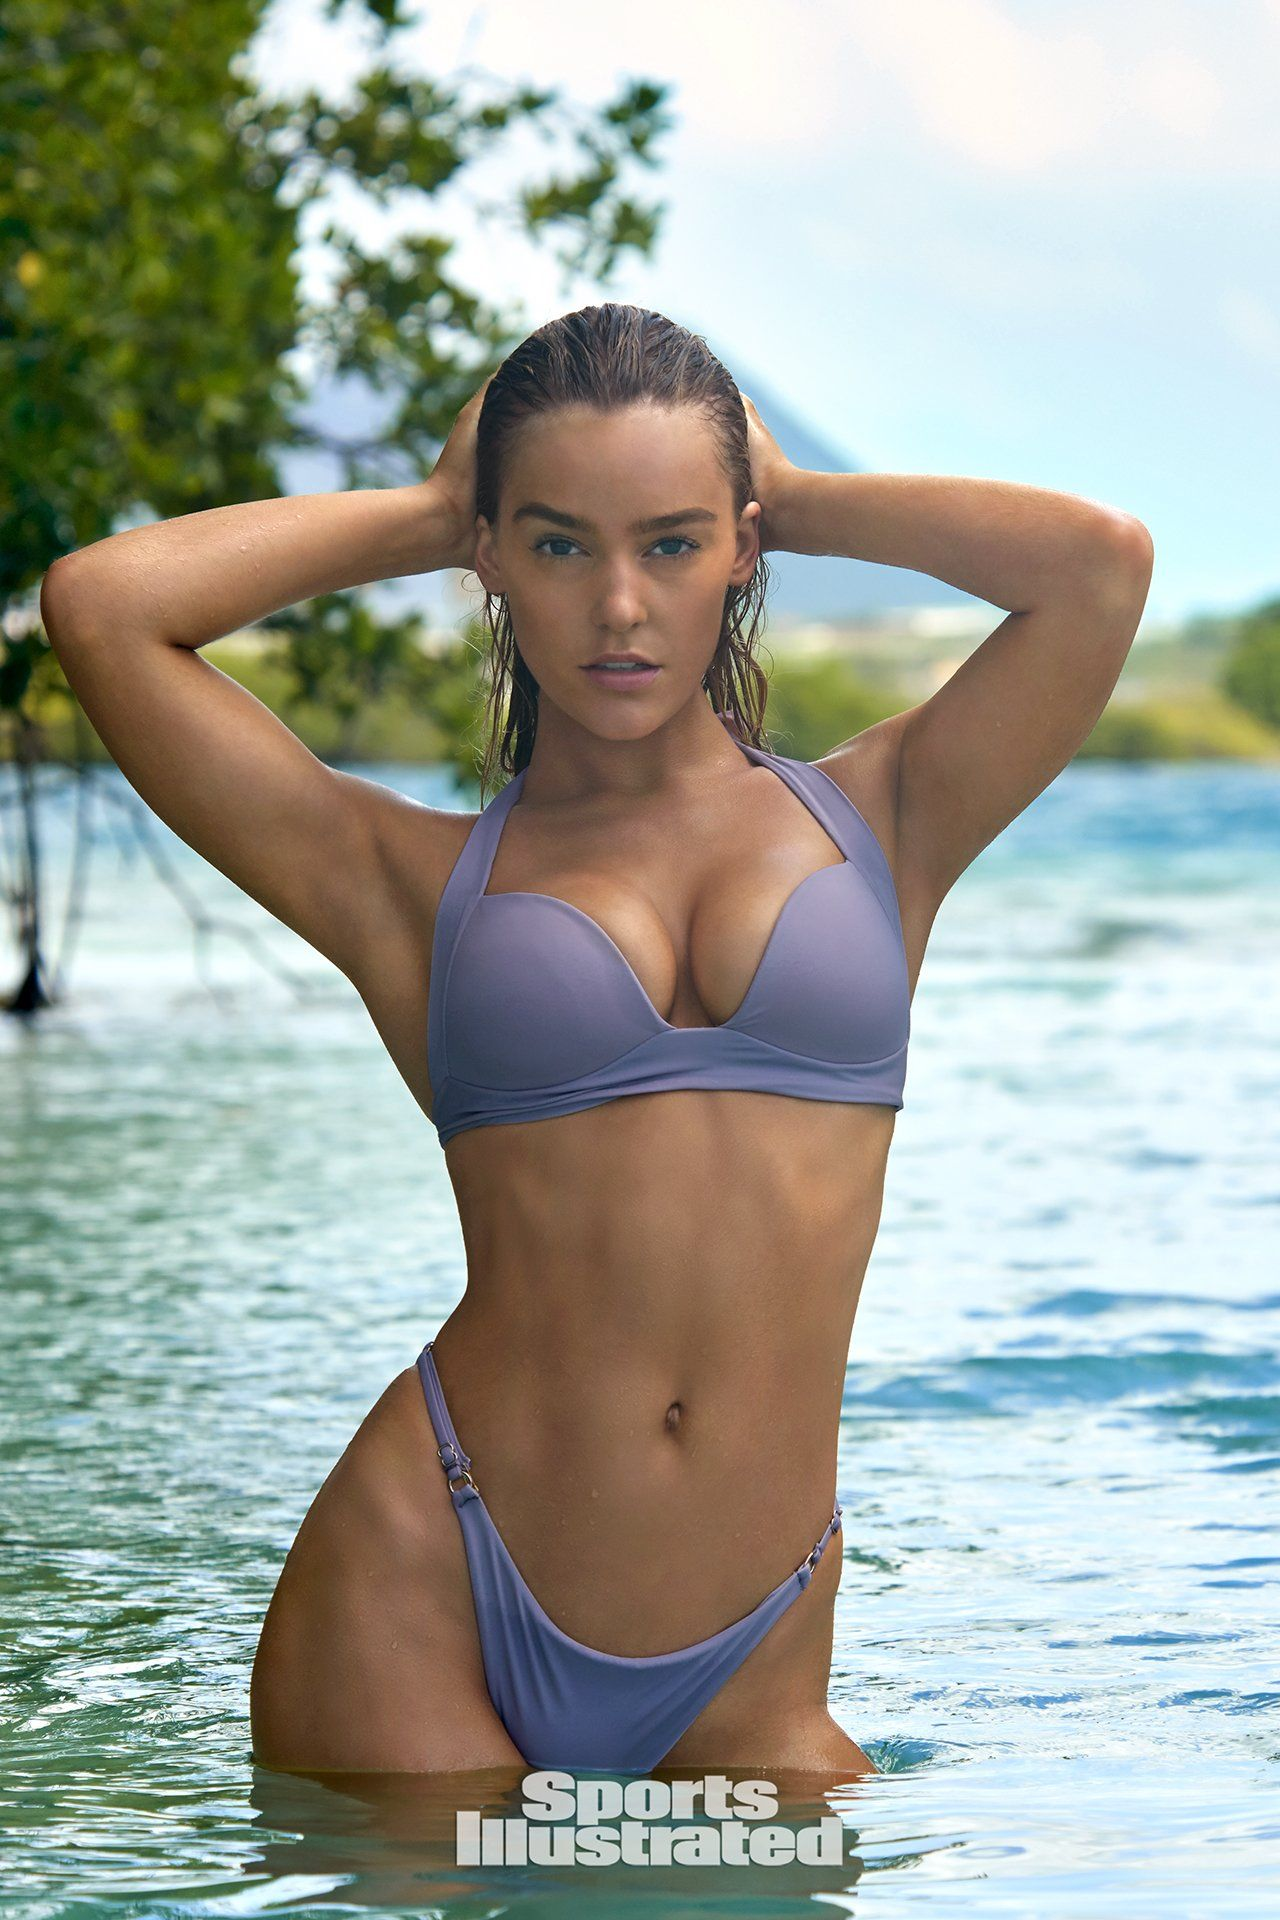 Georgia Gibbs TJ Swim Bikini Photoshoot Pic 7 of 35